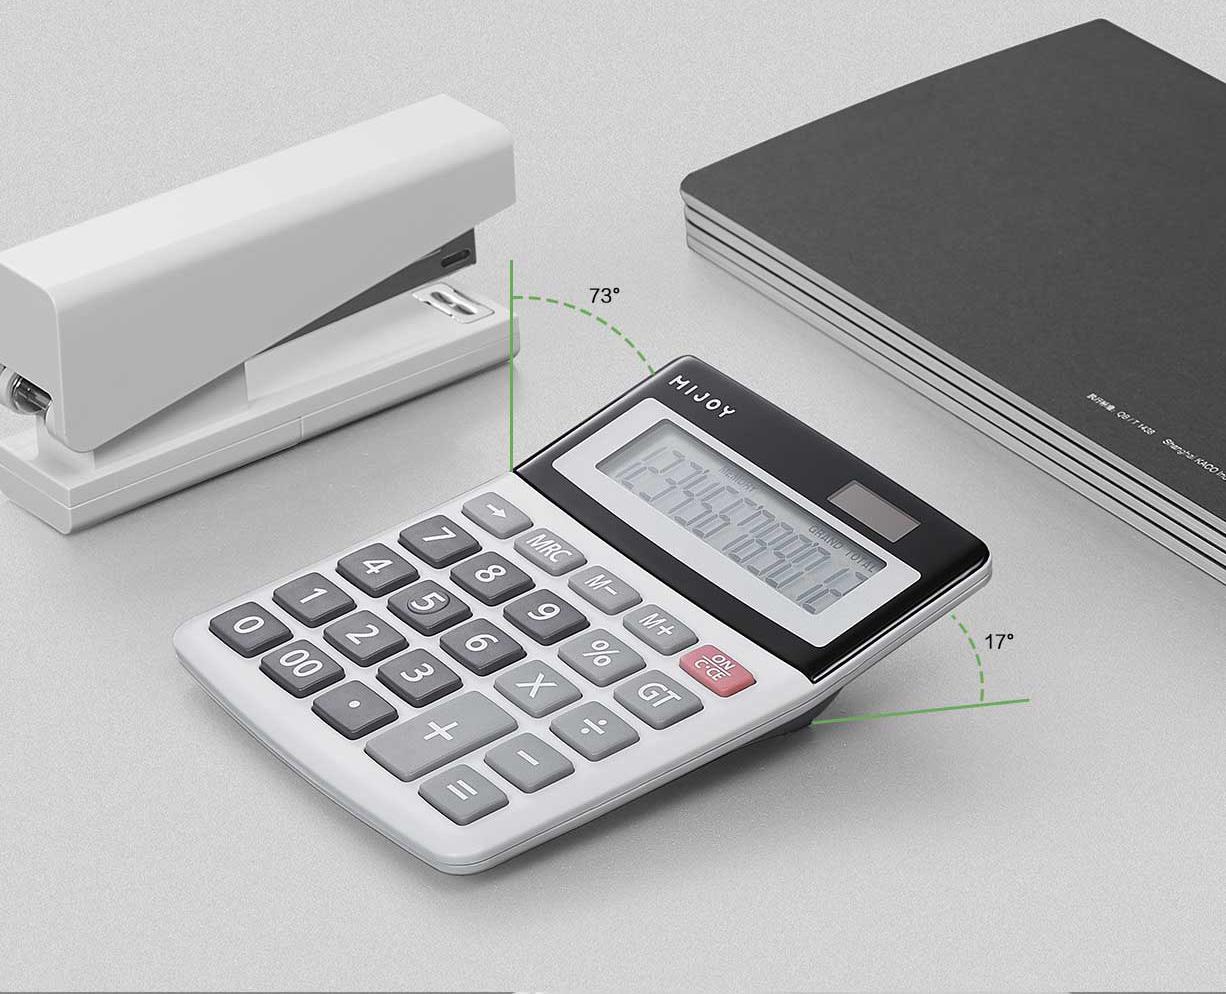 xiaomi mijoy calculator price